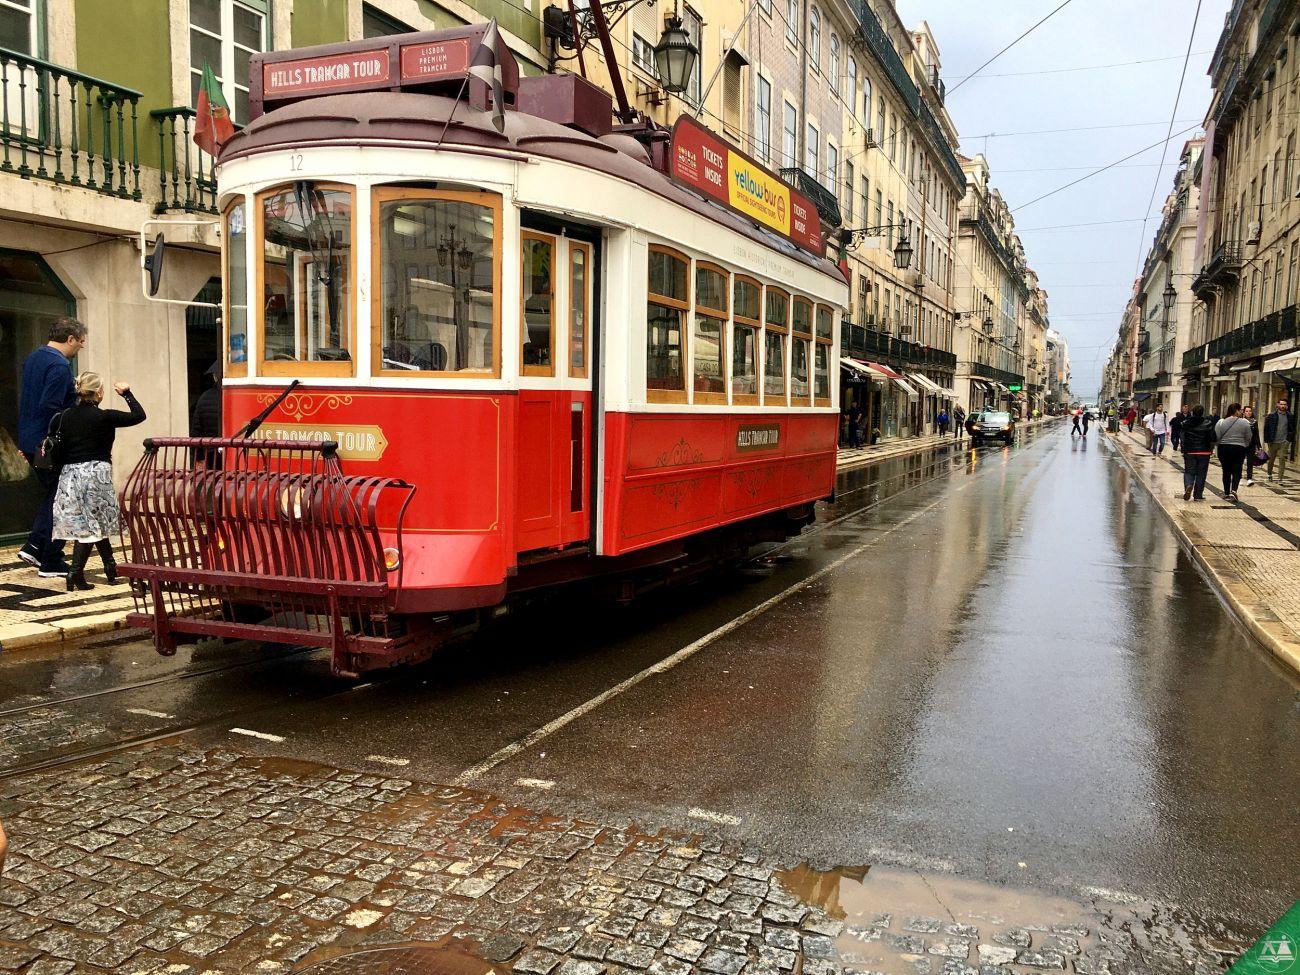 Erasmus-Braga-2019-Lizbona-Fatima-013